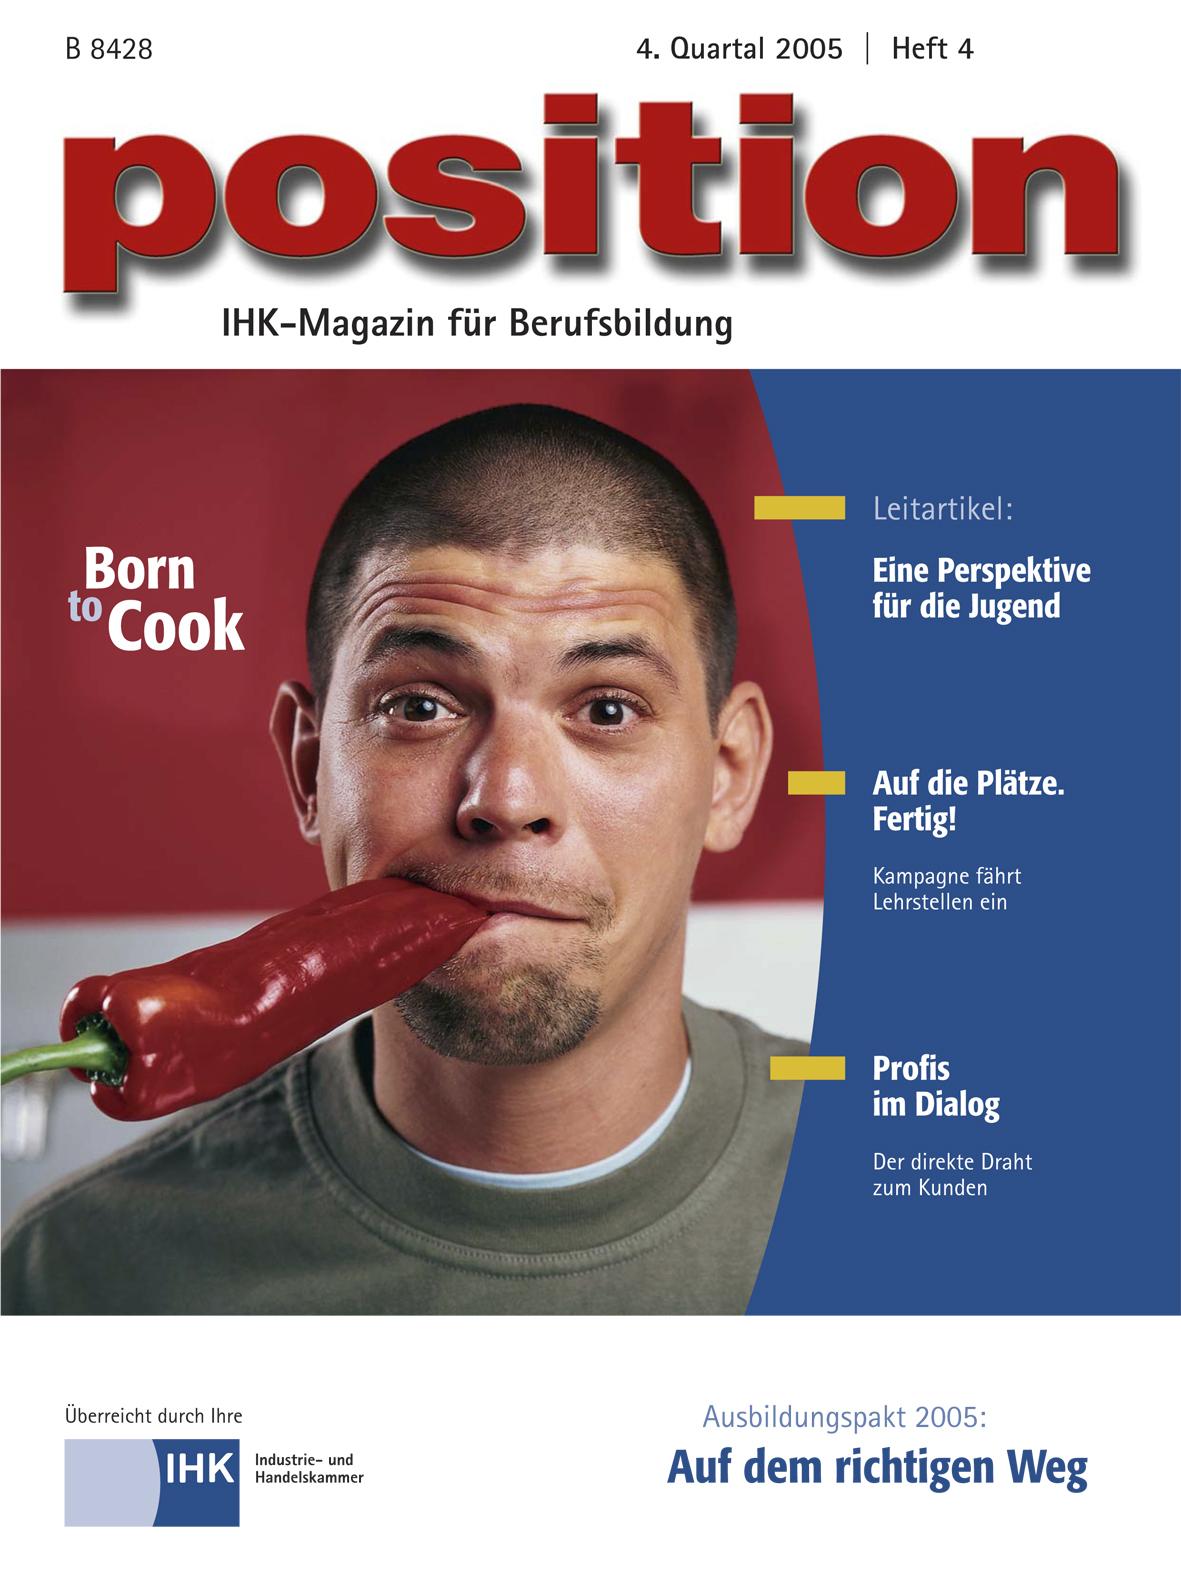 Titel-position-4-2005